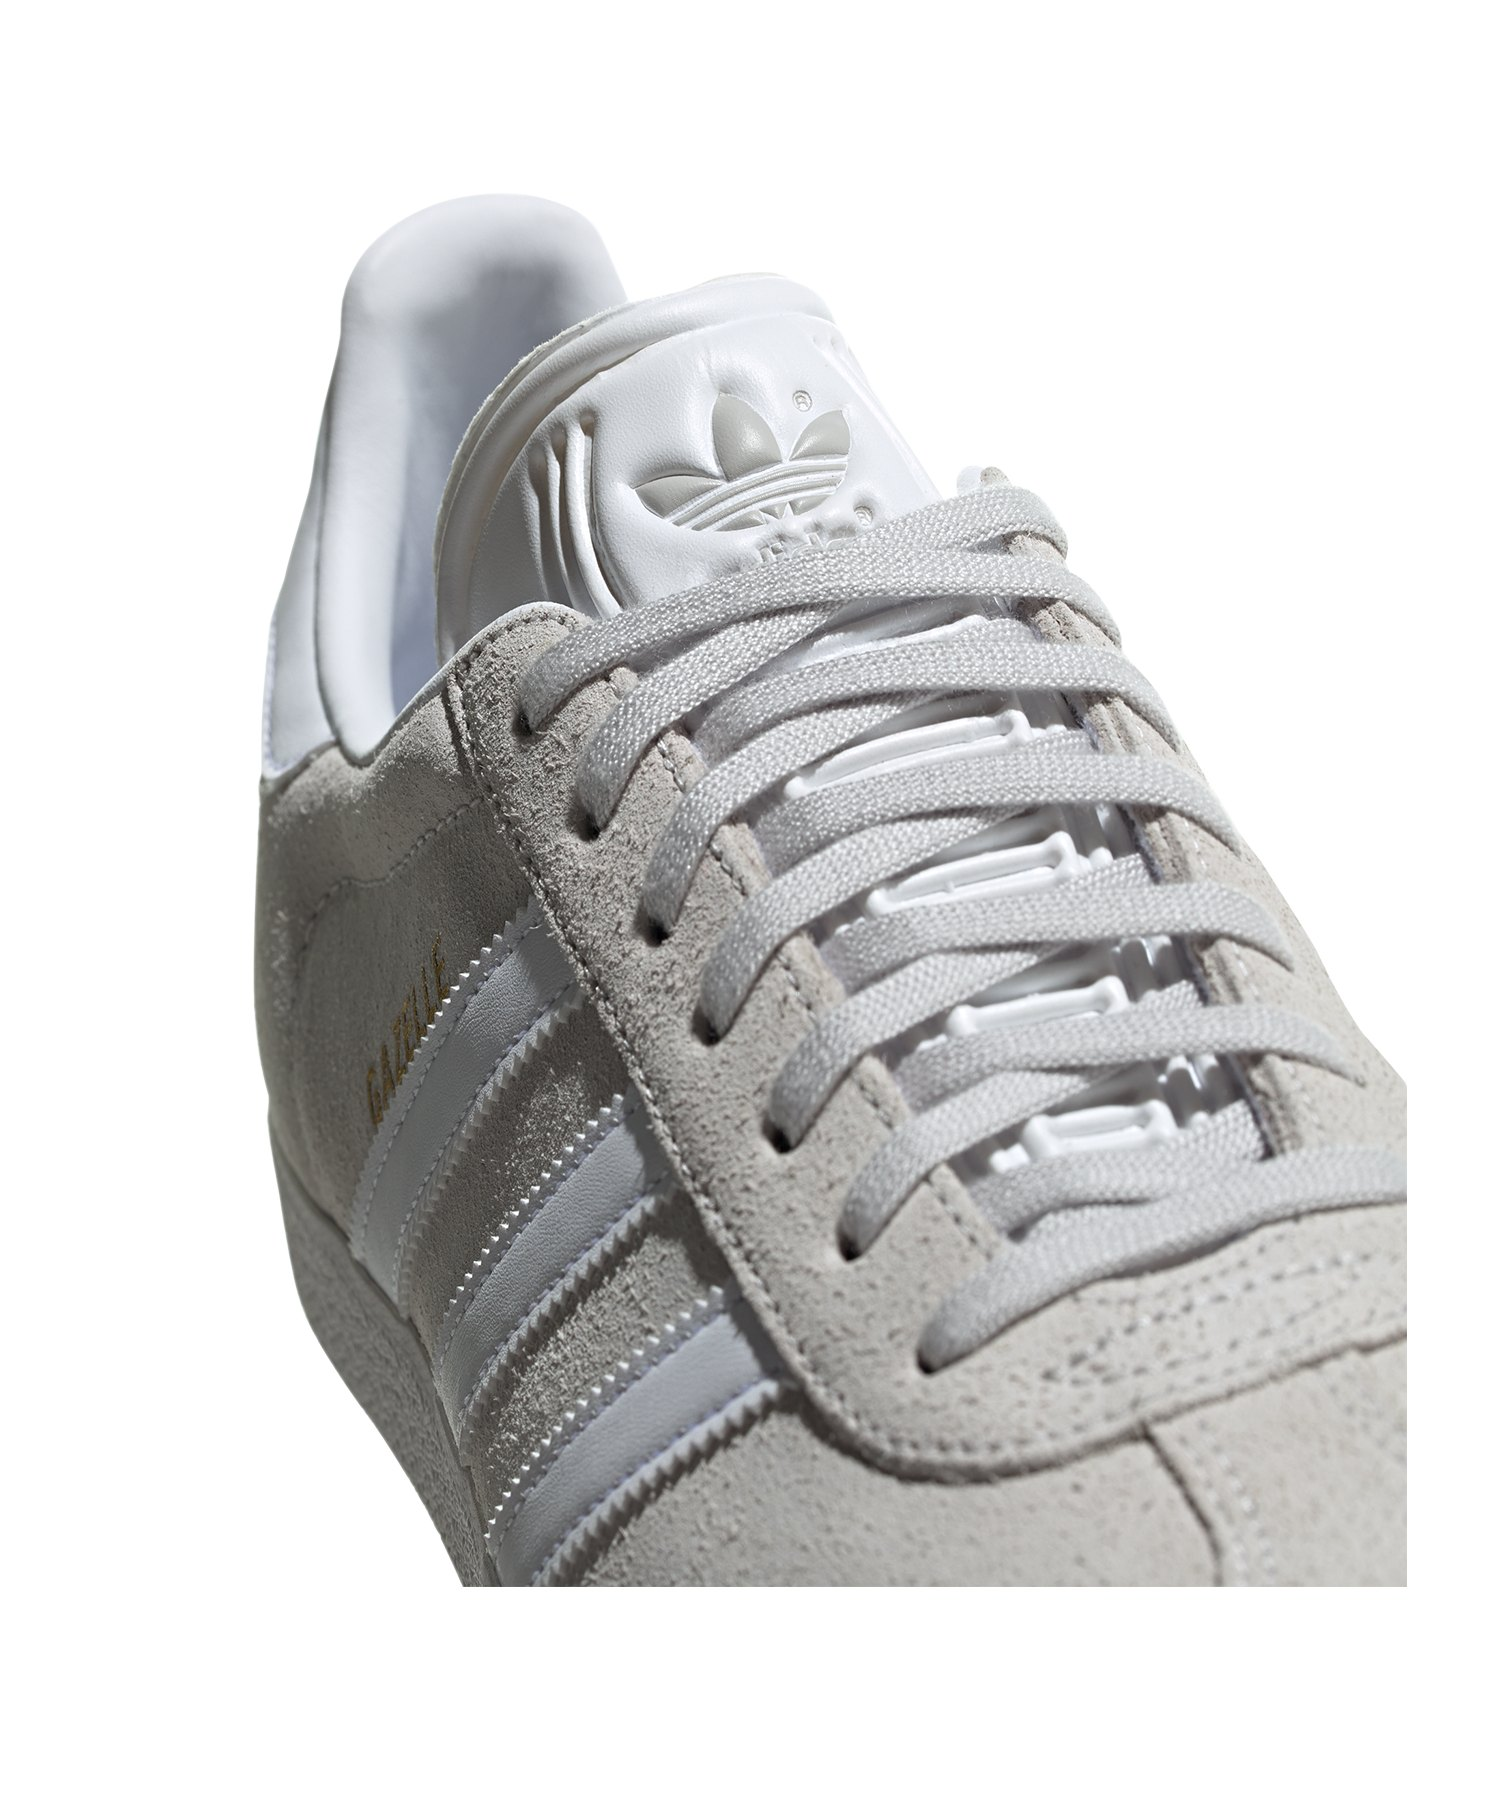 new style c03a7 b0fee ... adidas Originals Gazelle Sneaker Grau Weiss - Grau ...